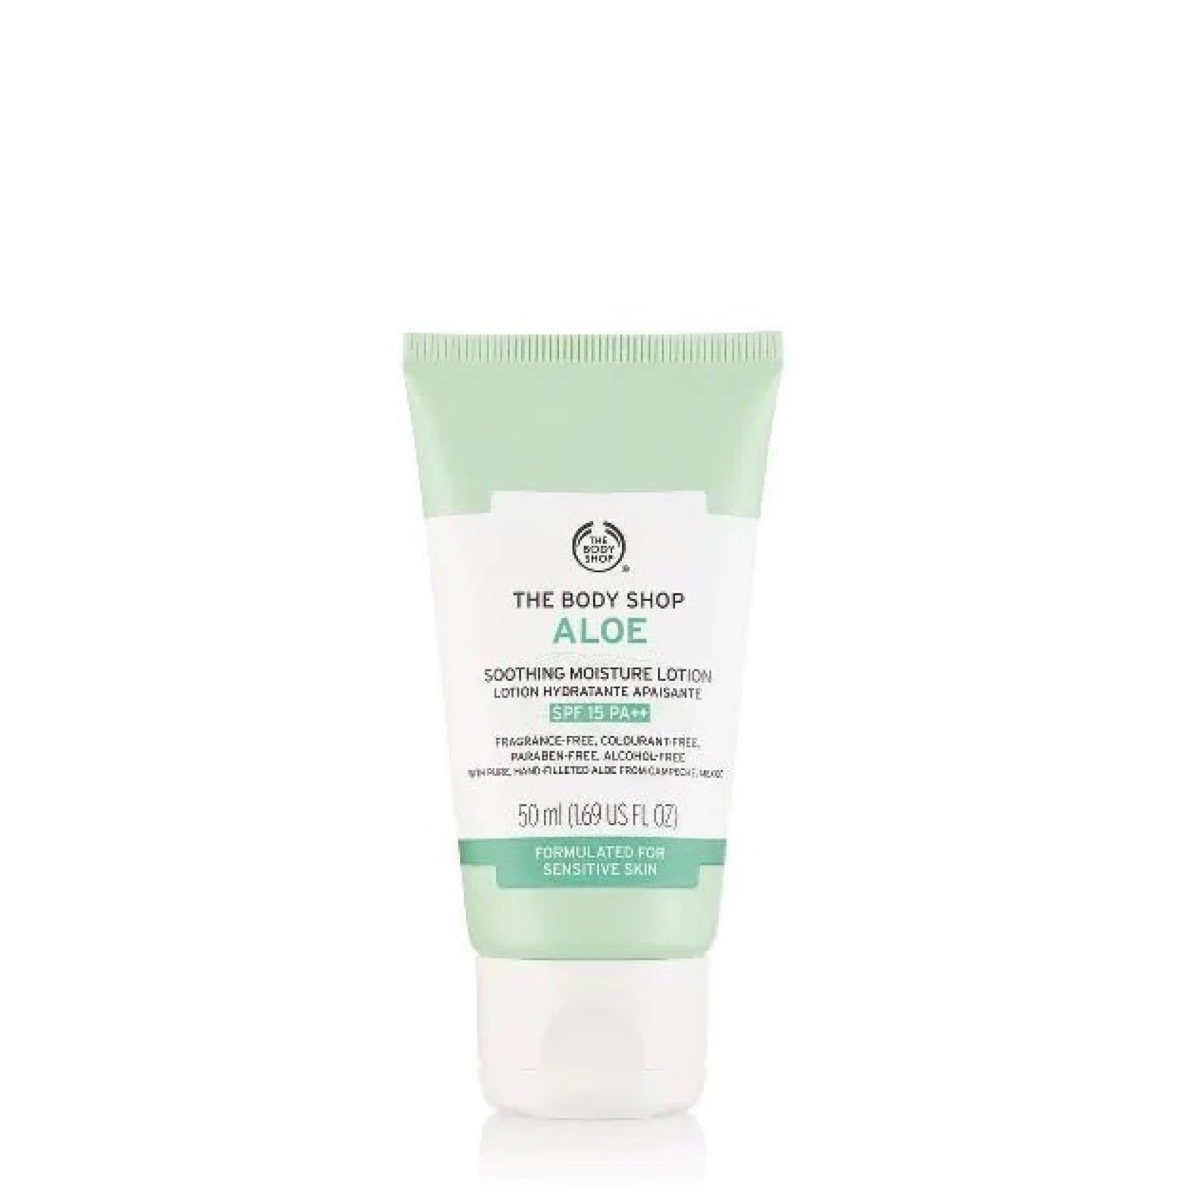 The Body Shop Aloe Lotion Travel Essentials